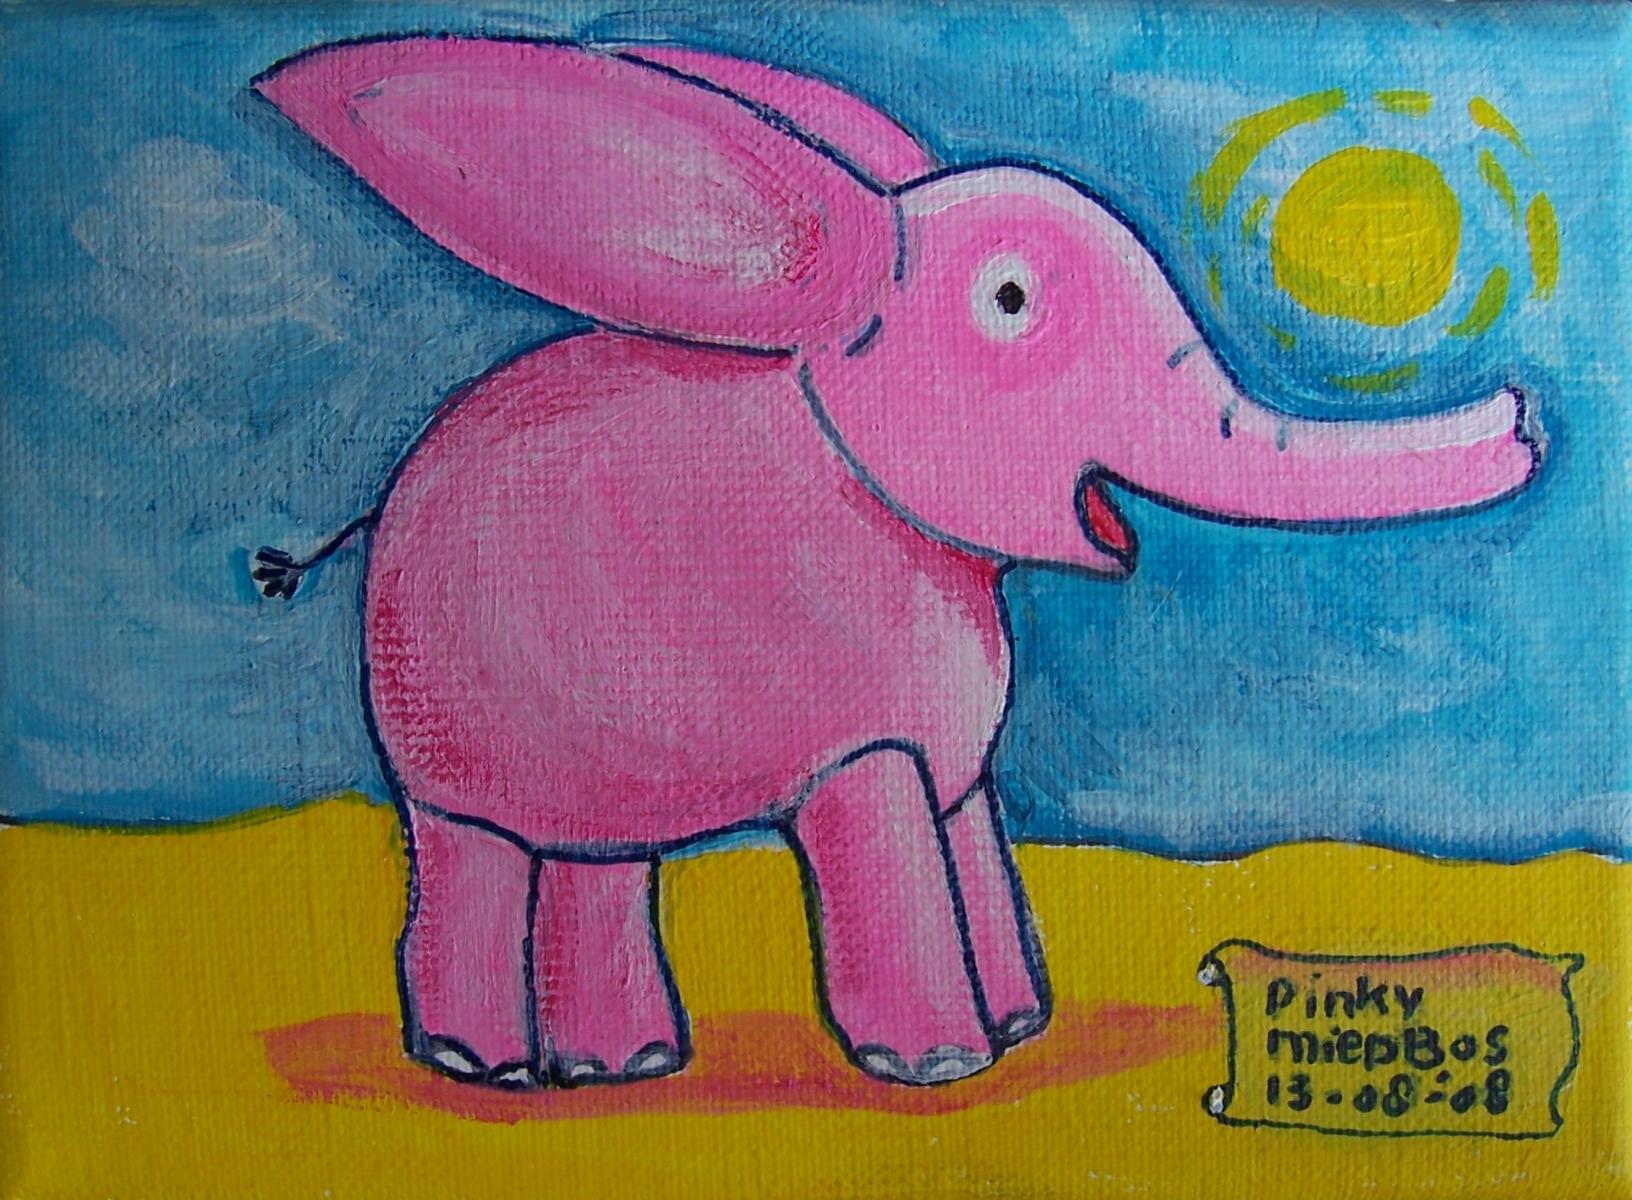 Pinky het roze olifantje Miep Bos 2008